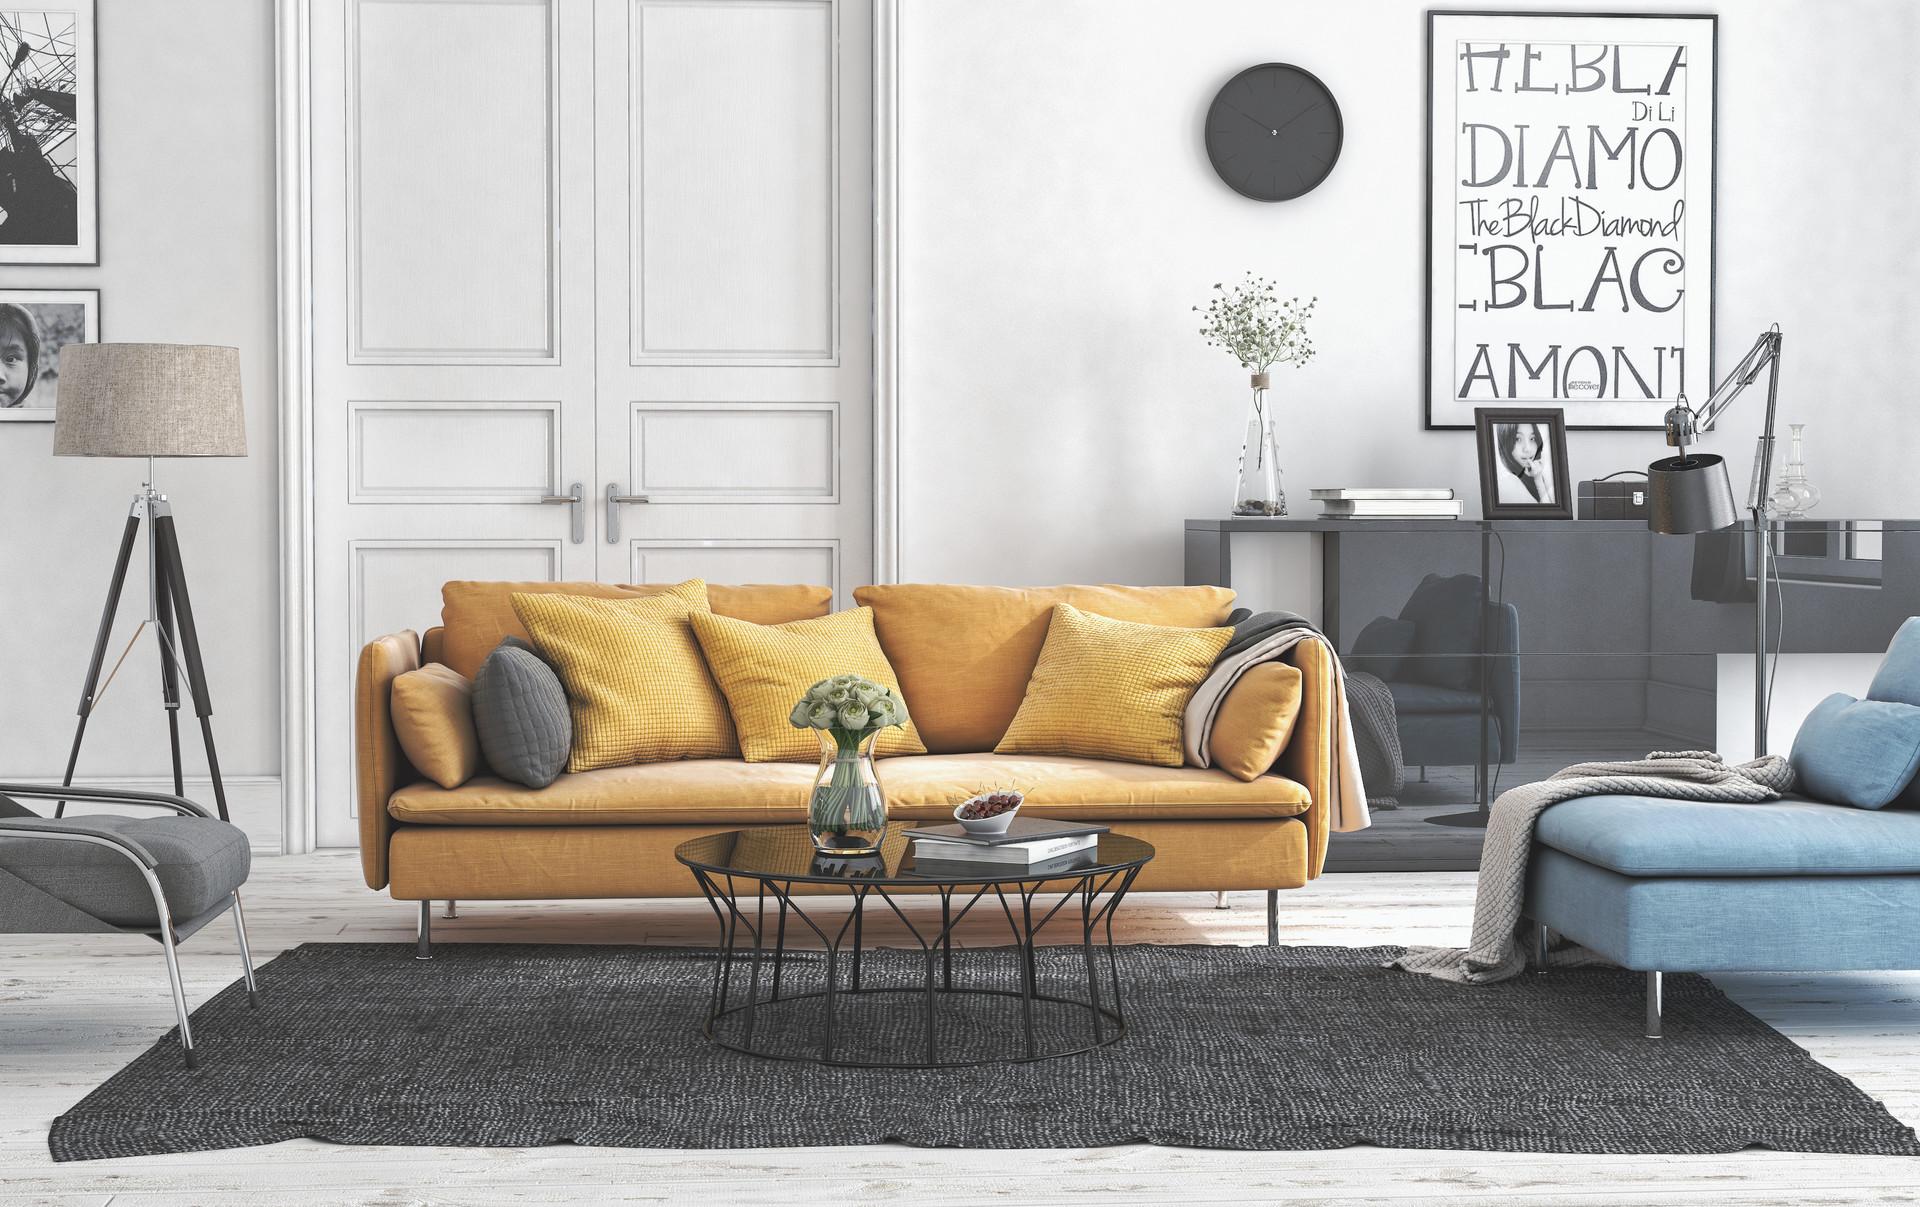 Artstation 3d Okulu Office Work Ikea Living Room Yellow Sofa 3d Okulu